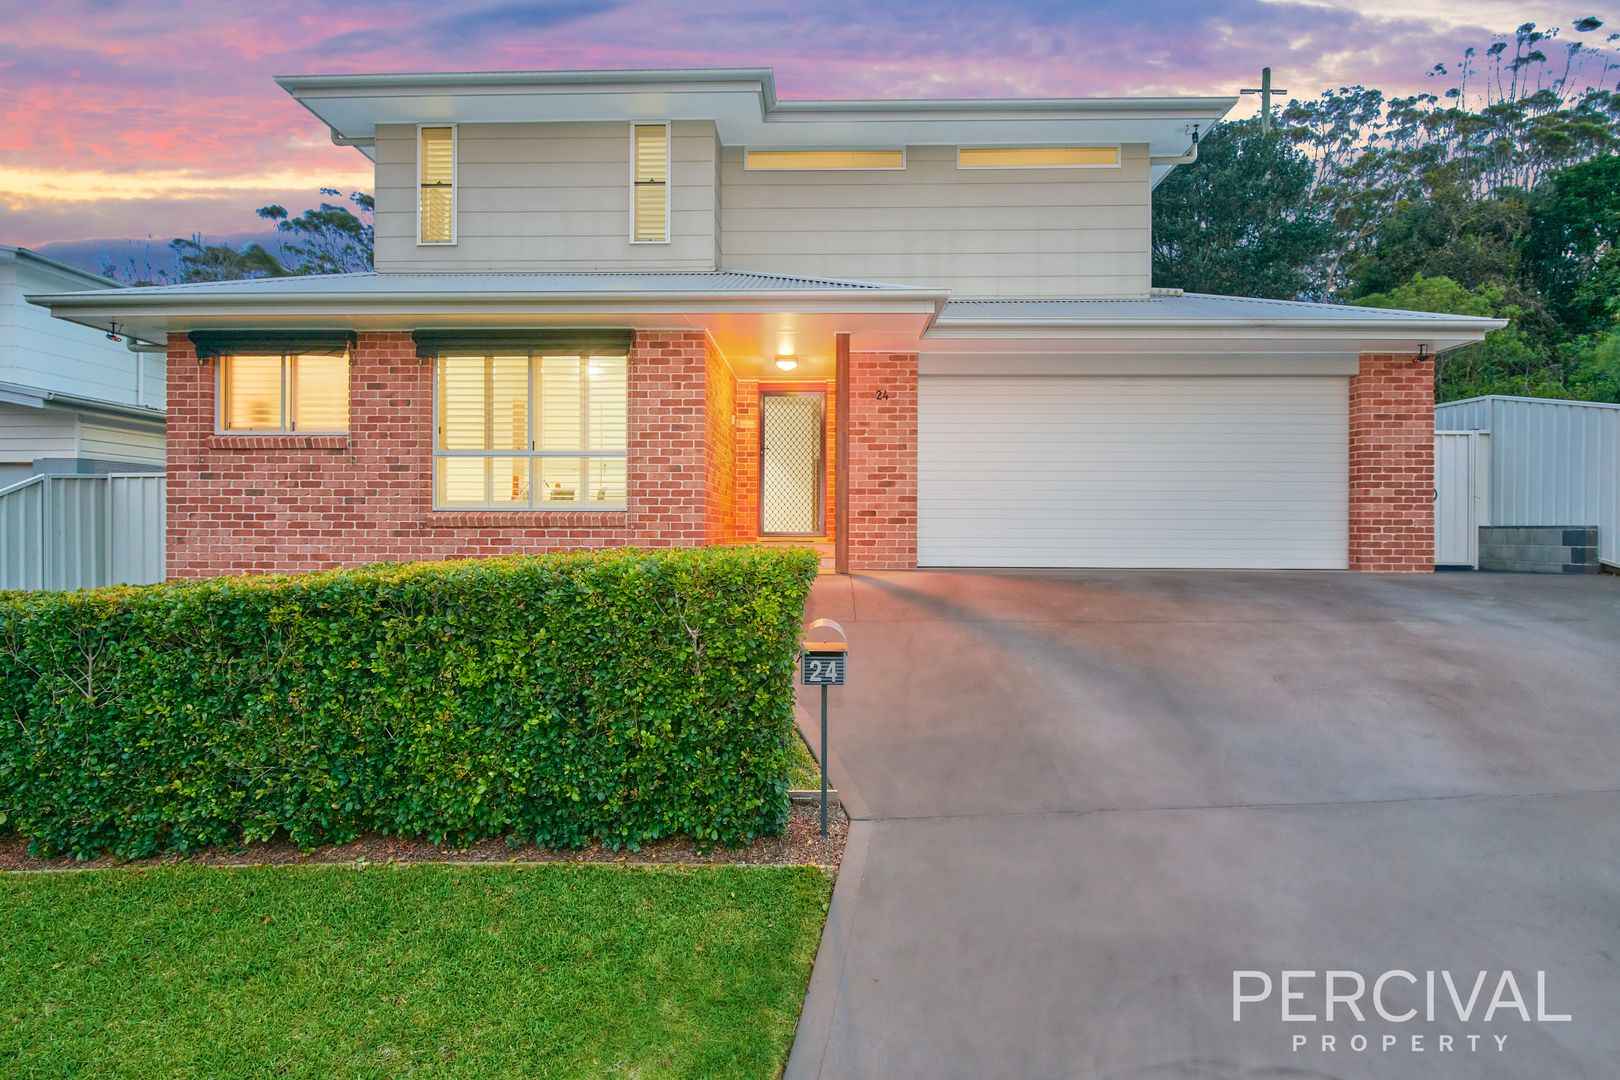 24 Waverley Glade, Port Macquarie NSW 2444, Image 1